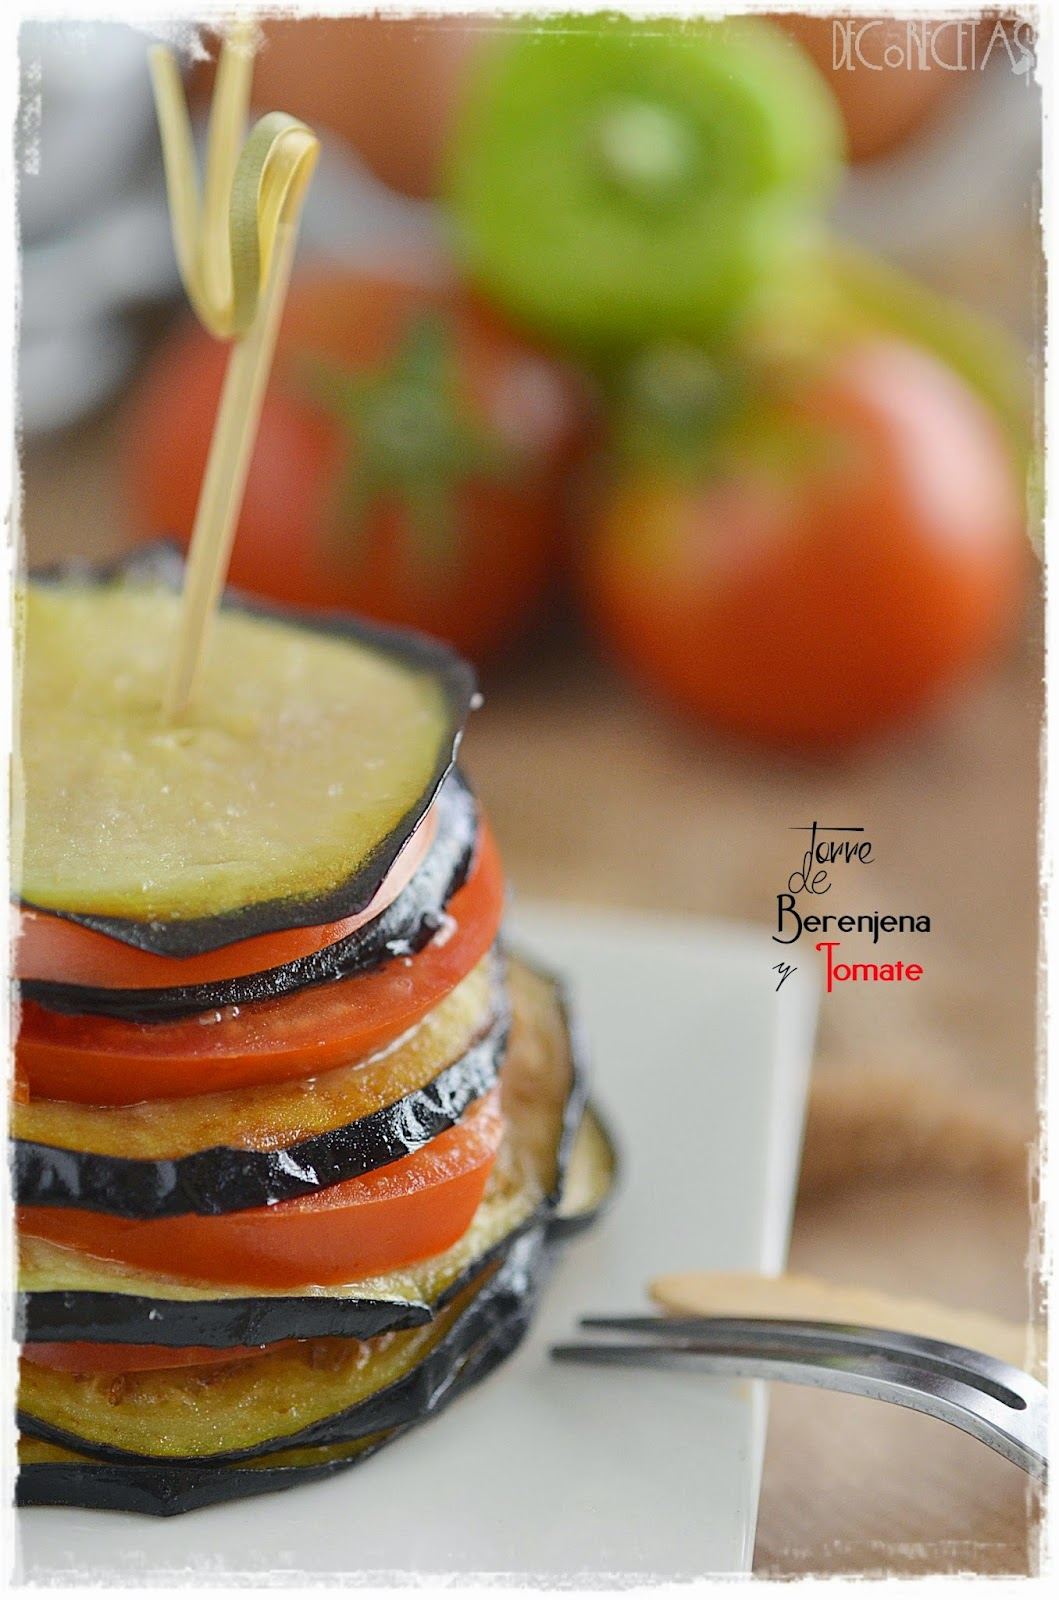 Torre de berenjena y tomate